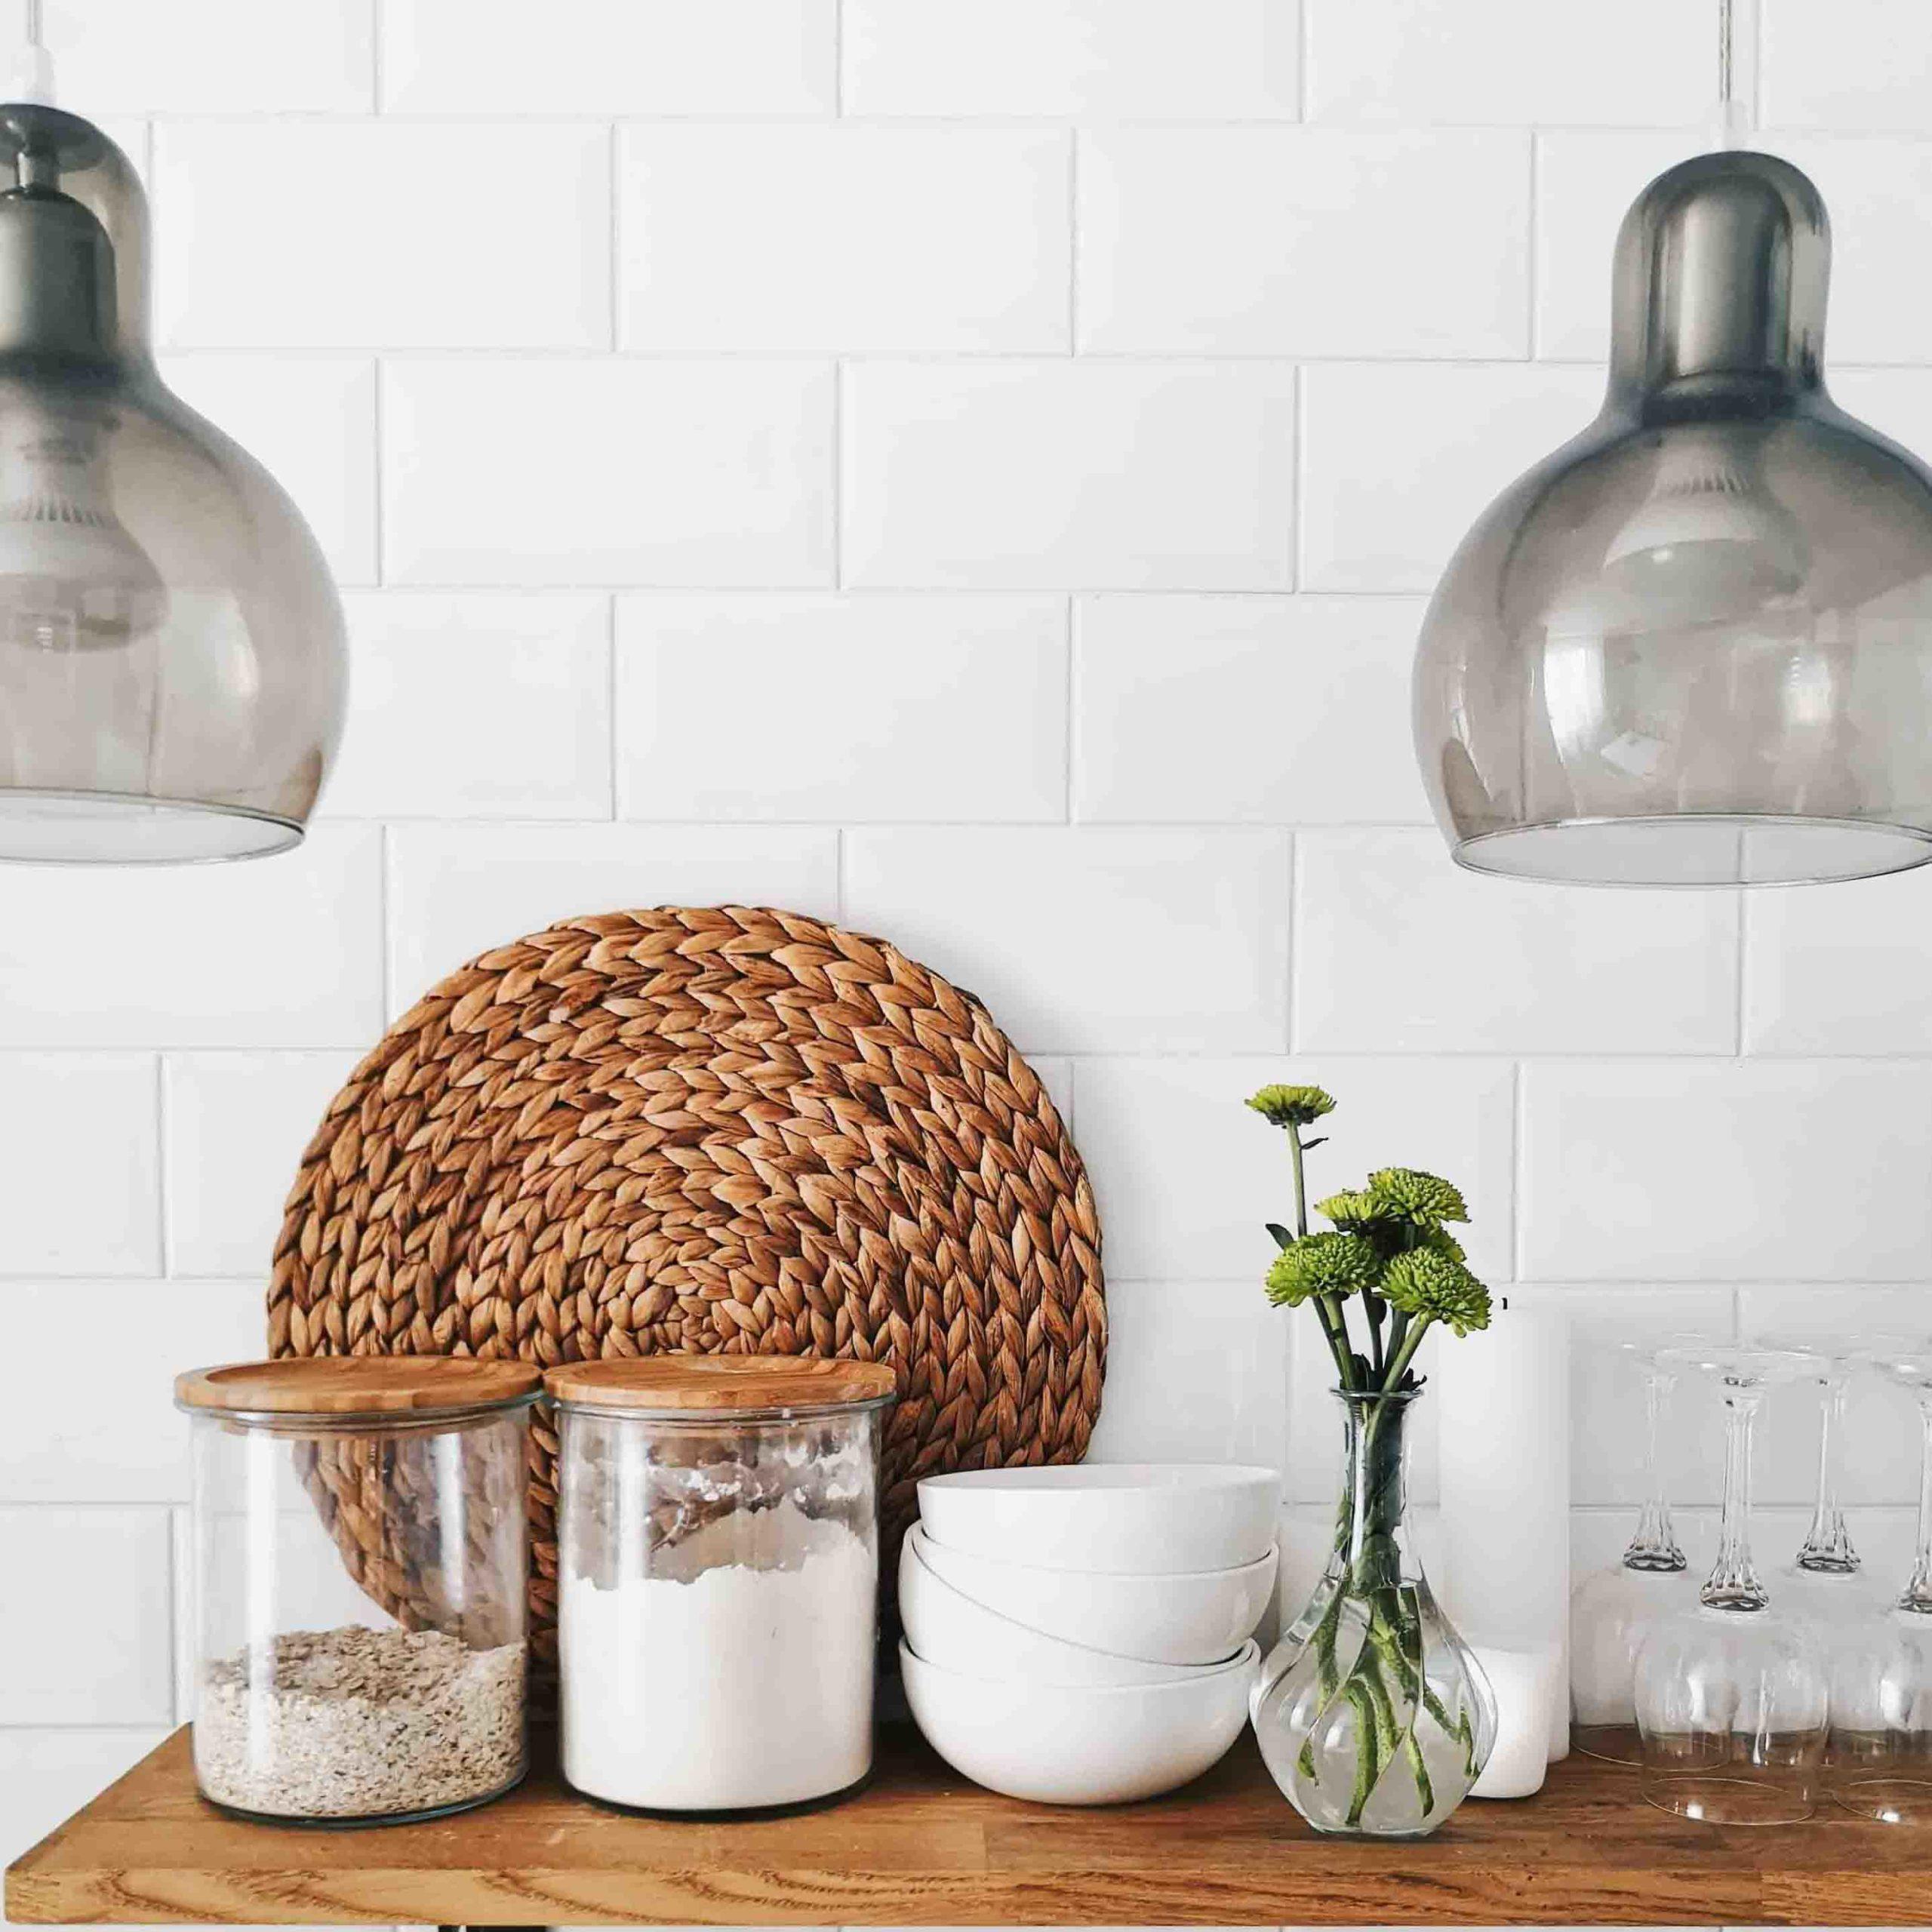 10 Tipps Um Kuchen Zu Verschonern Natural Hygge By Patricia Morgenthaler